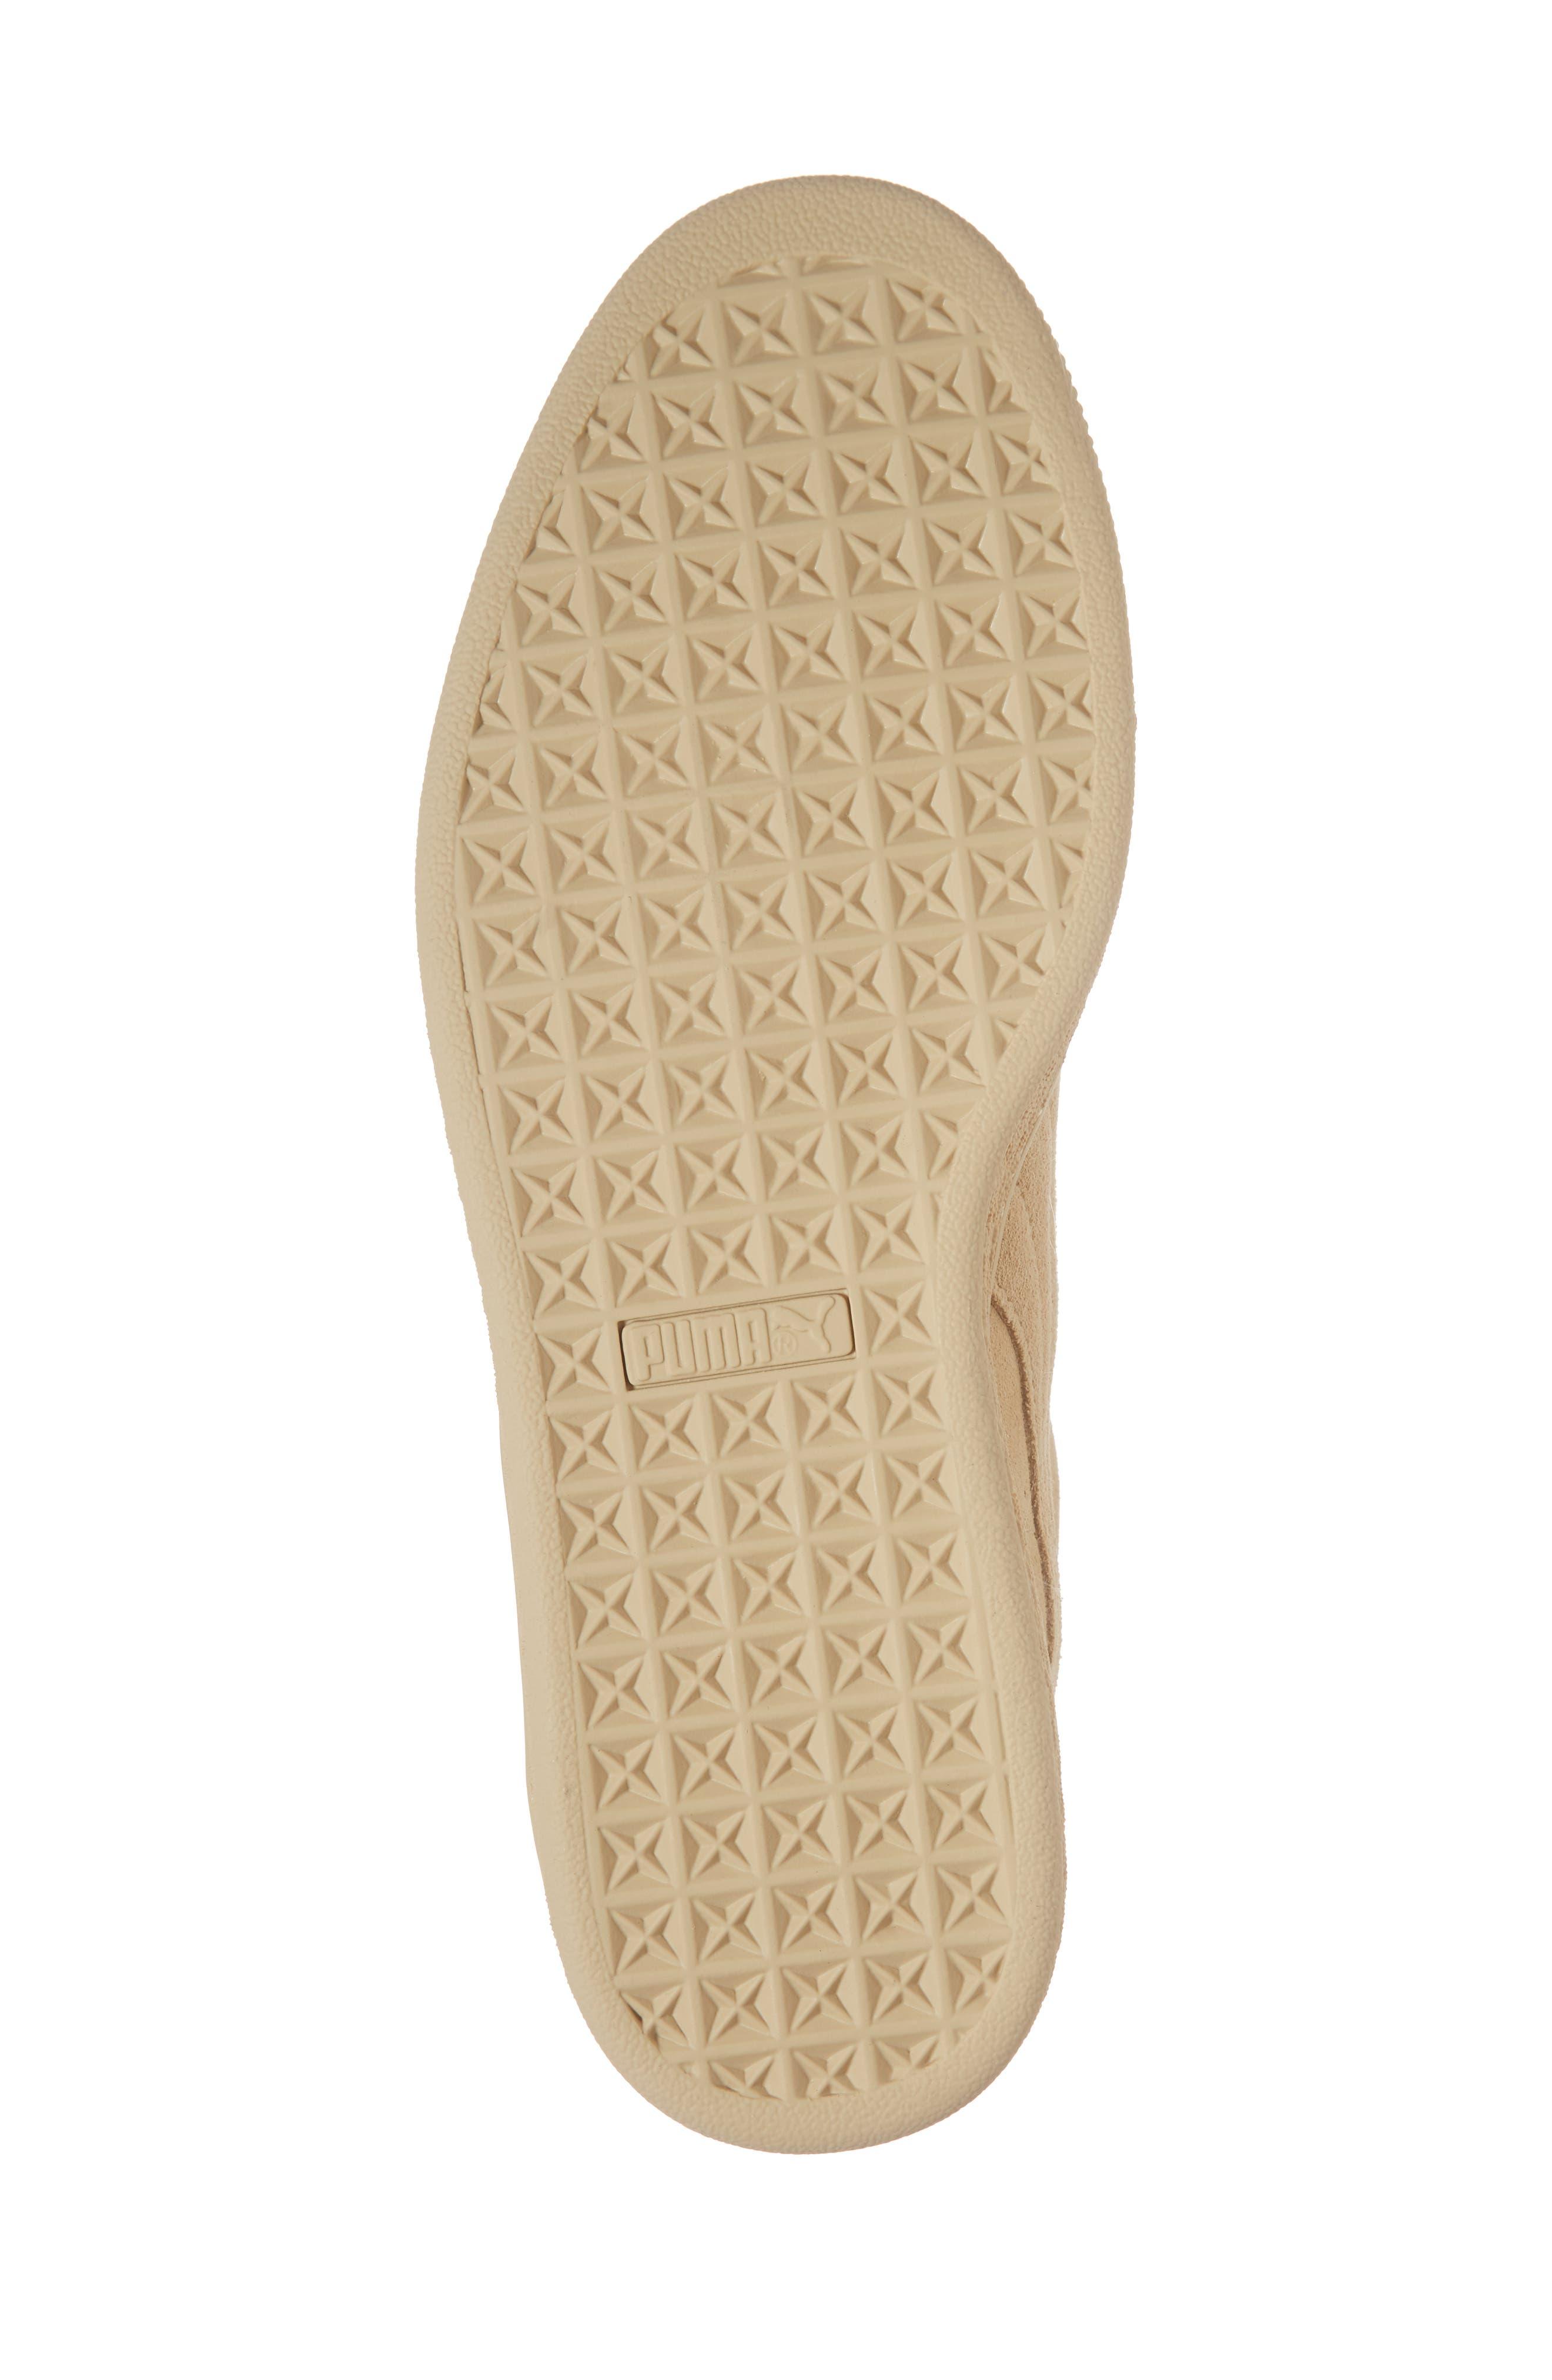 Suede Classic Tonal Sneaker,                             Alternate thumbnail 6, color,                             Pebble Suede